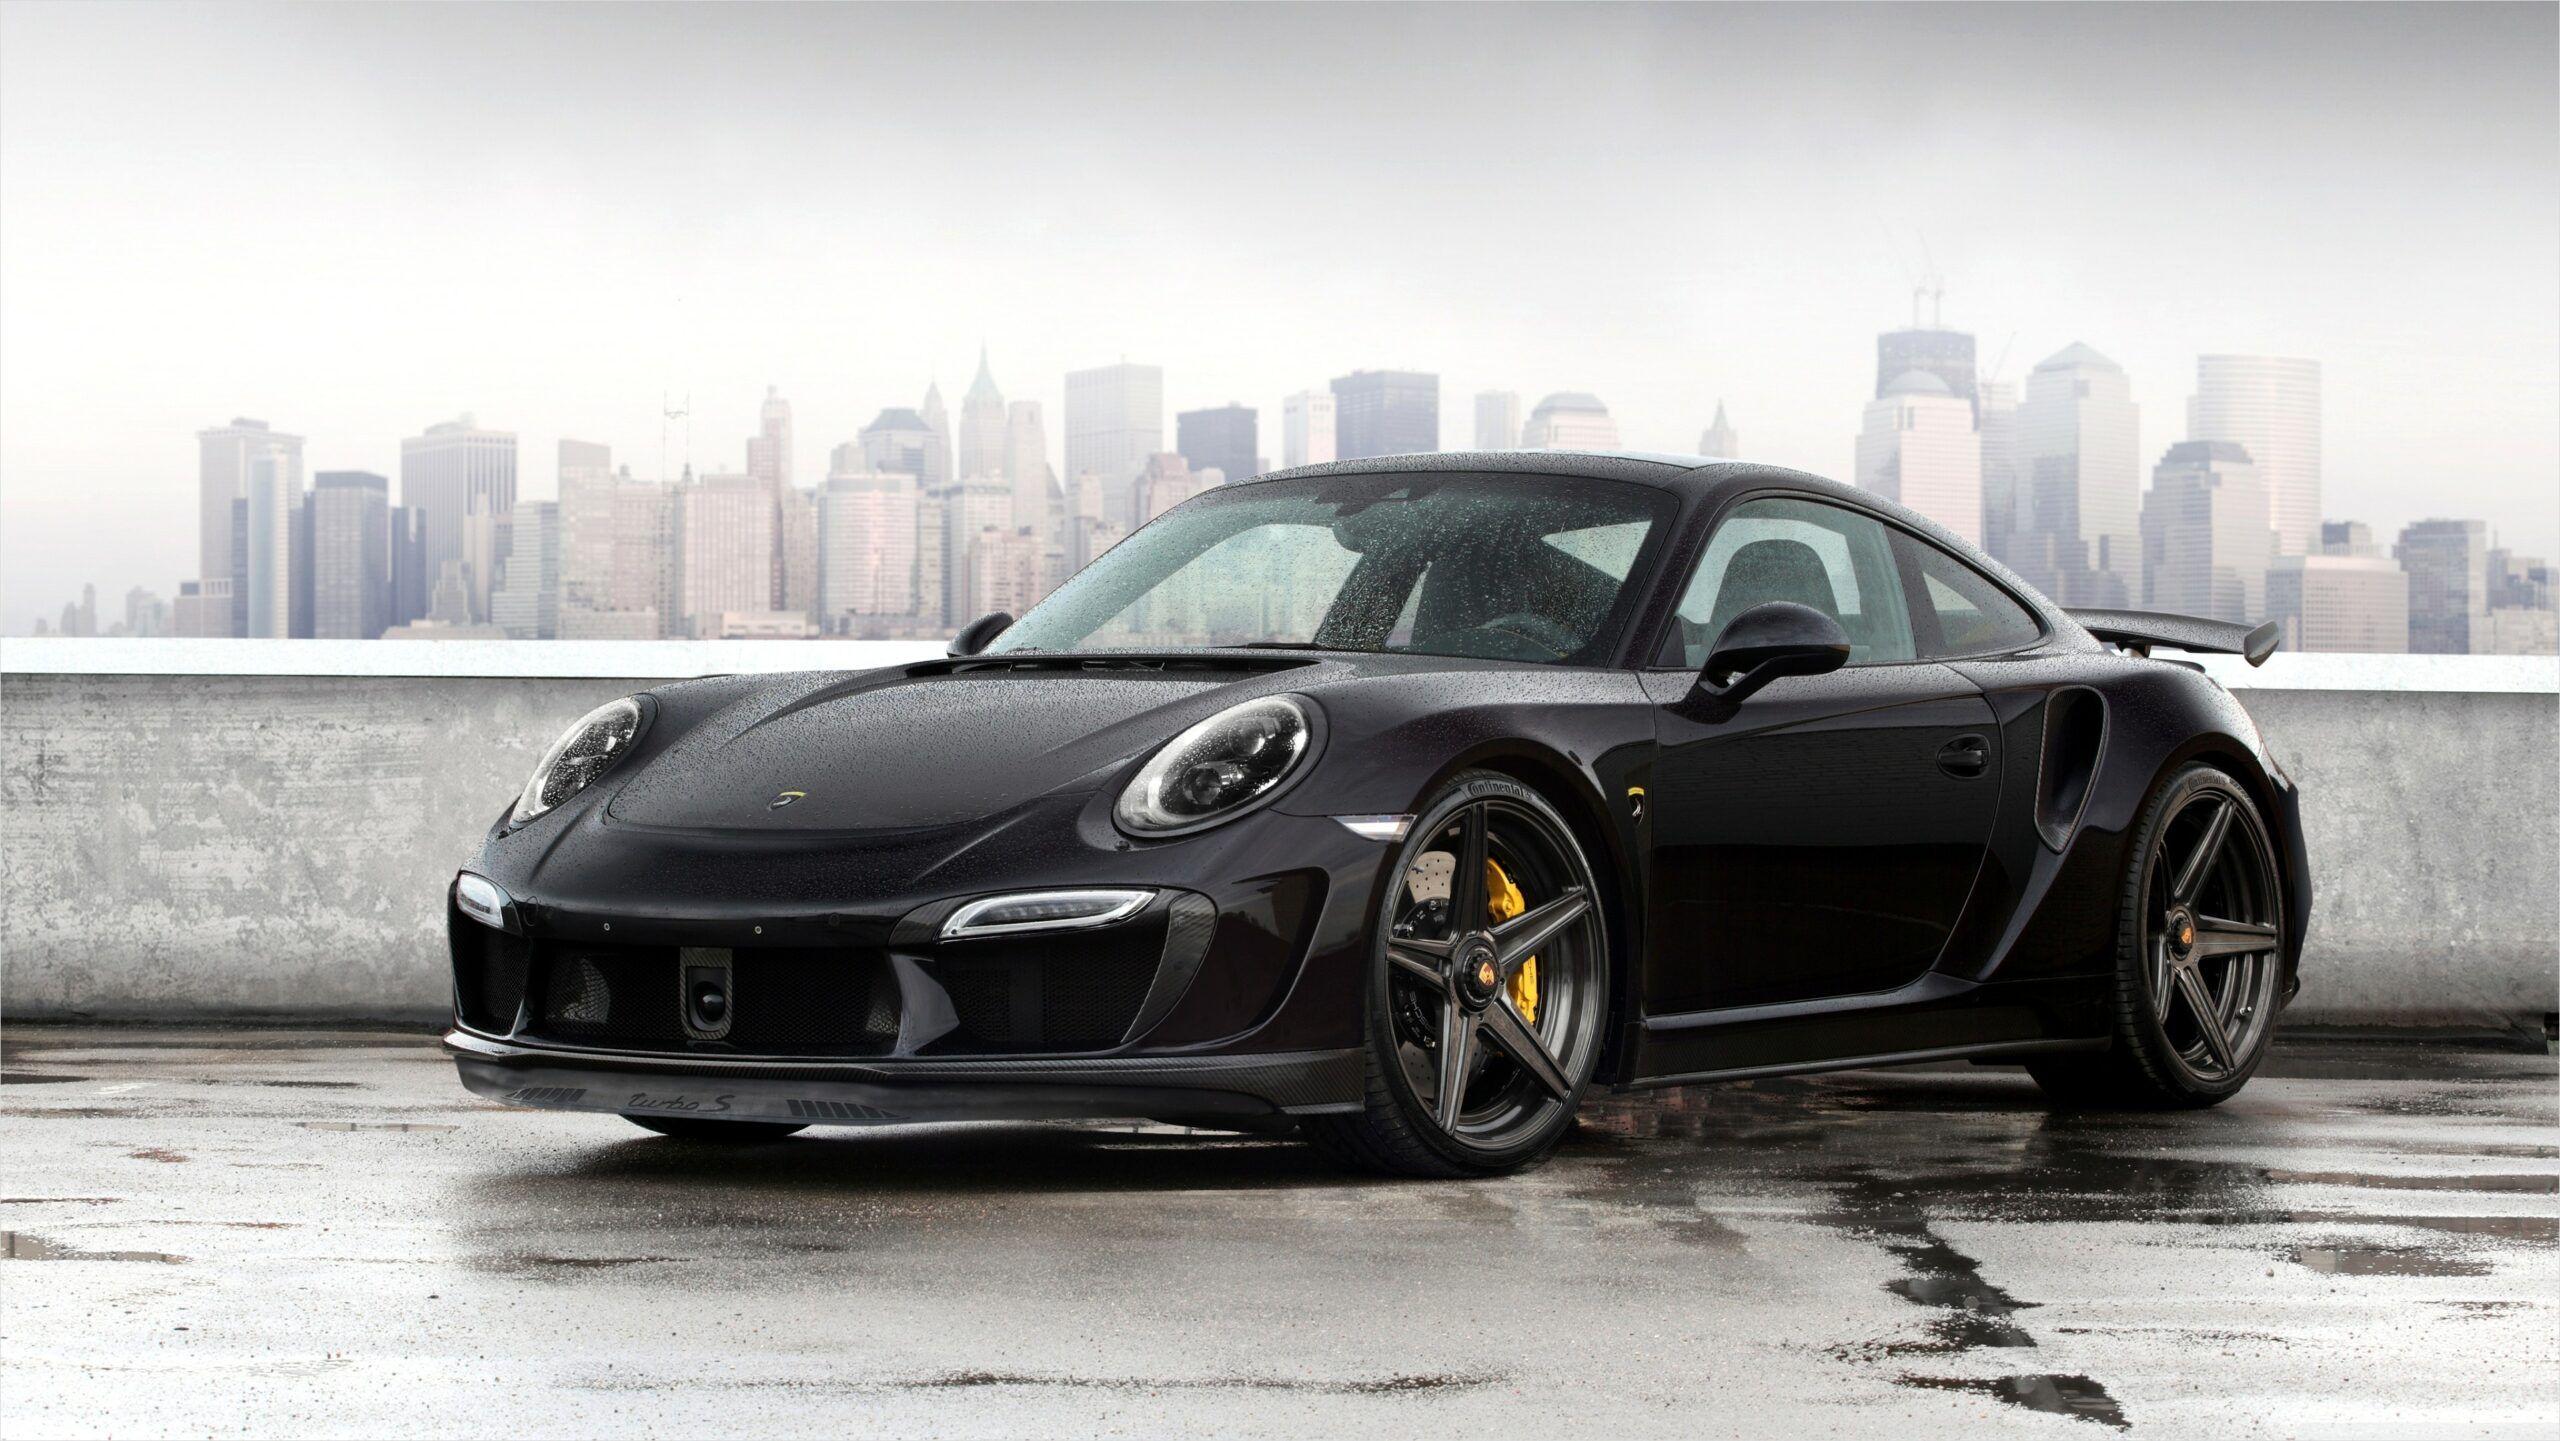 16 9 4k Hdr Wallpapers Porsche In 2020 Porsche 911 Black Porsche Porsche 991